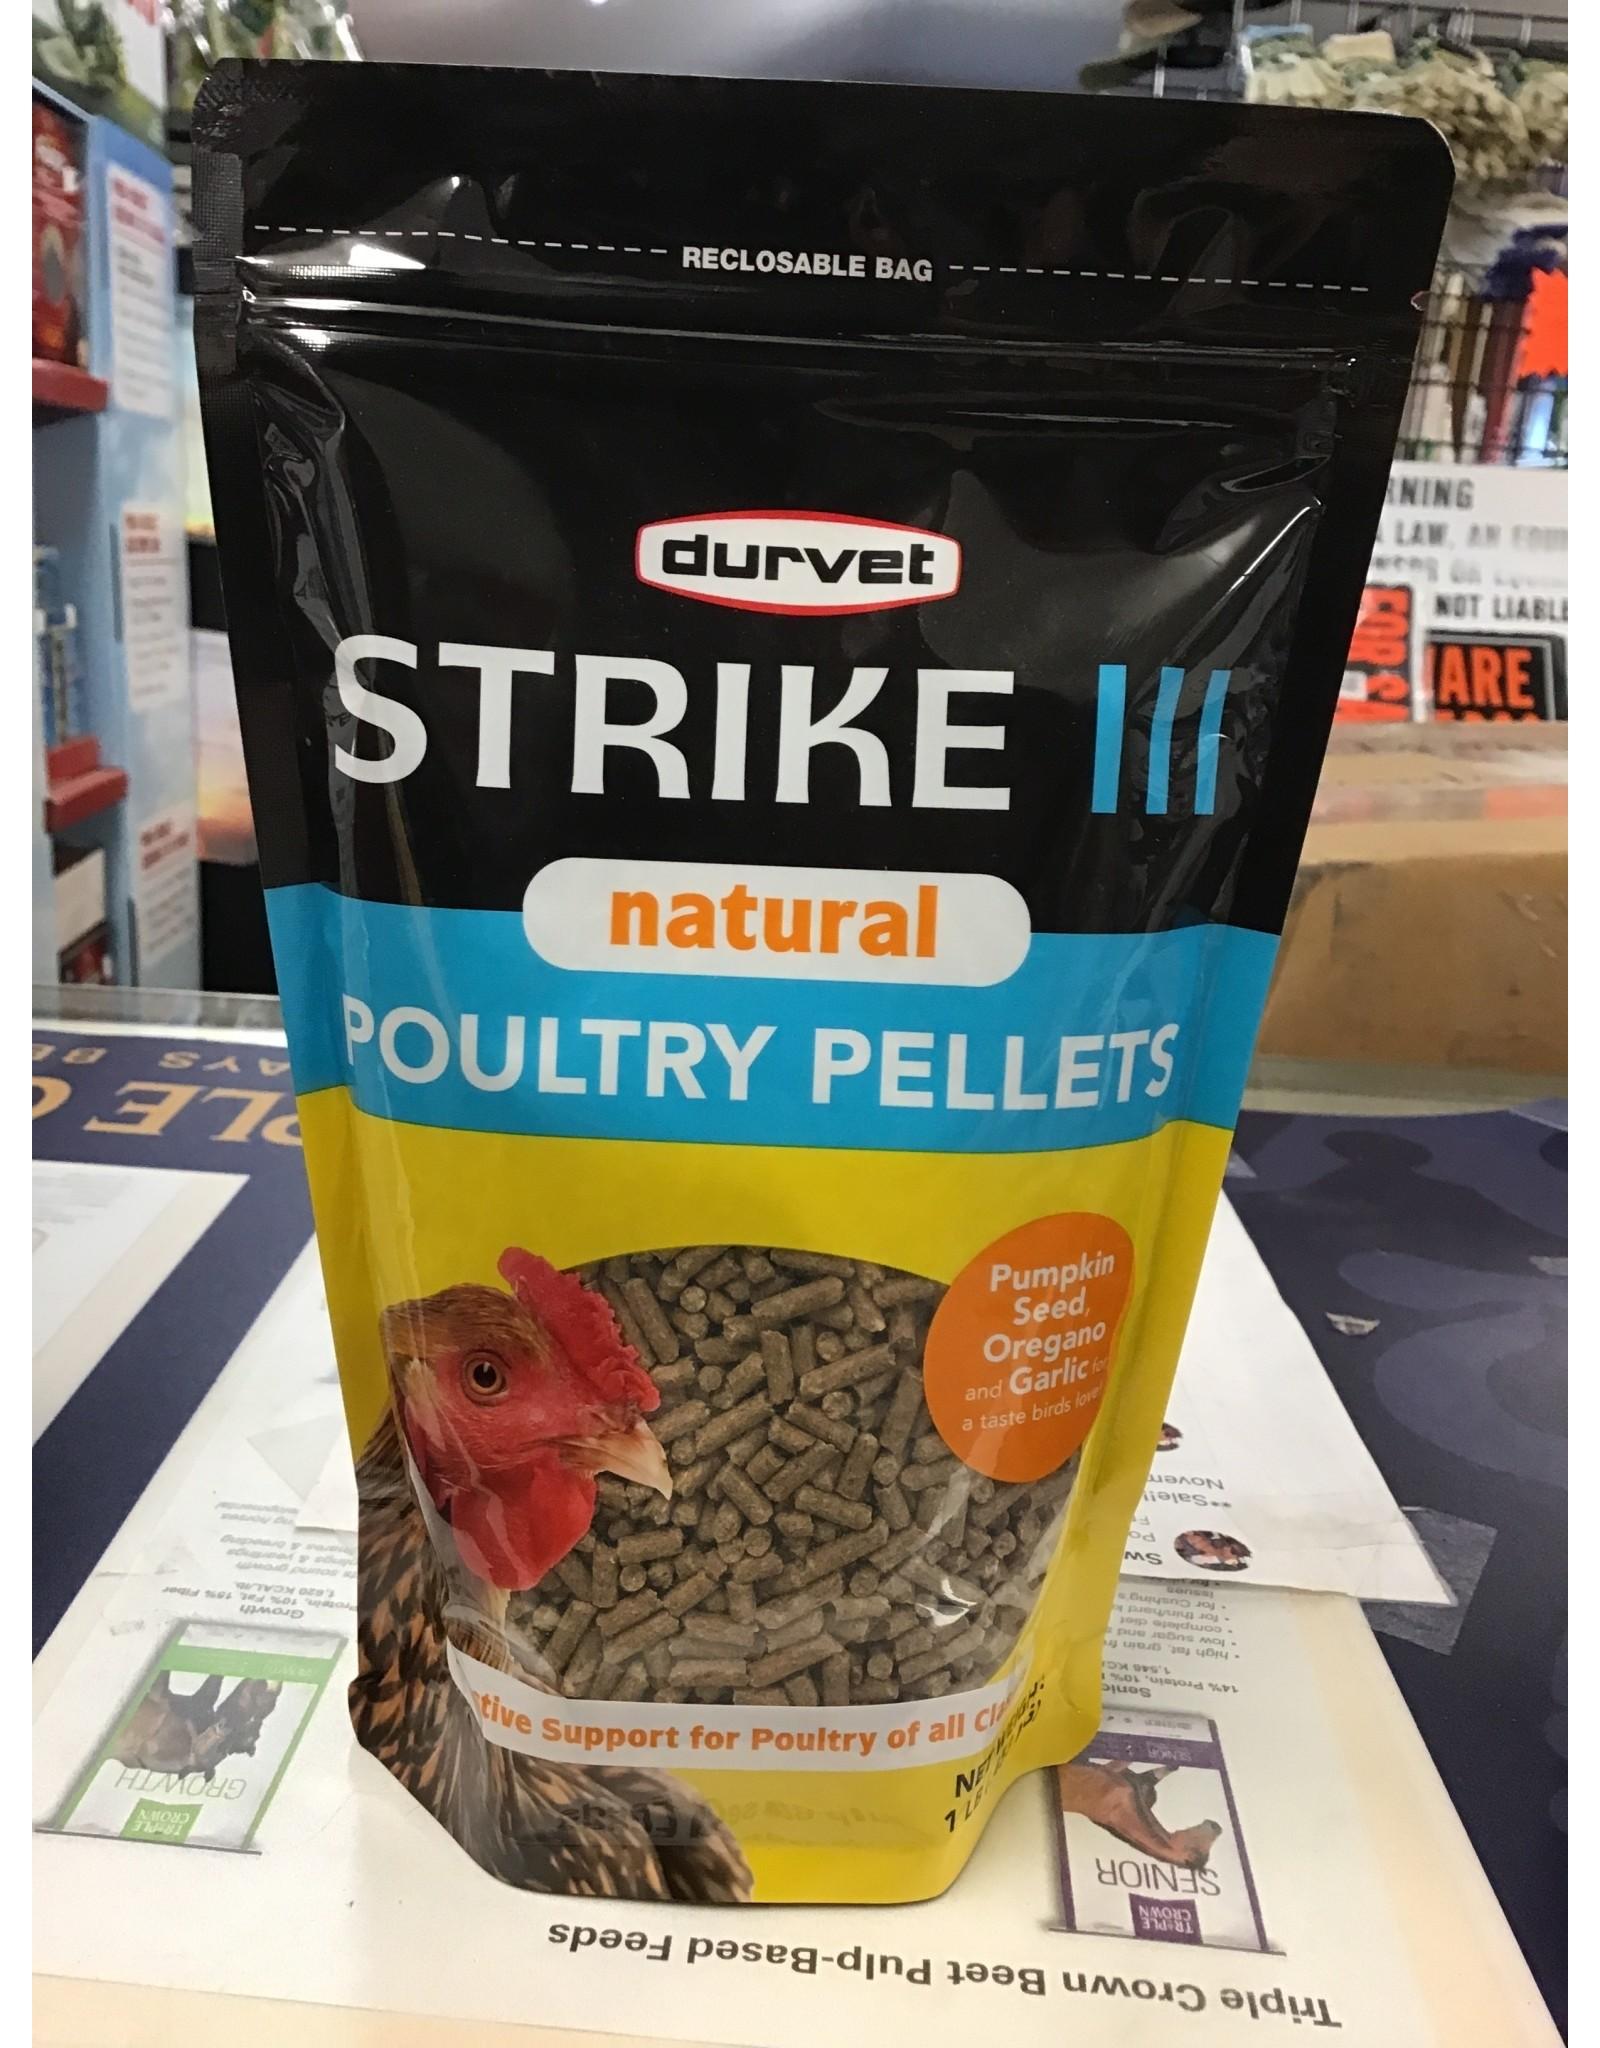 Durvet Strike III Natural Poultry Pellet